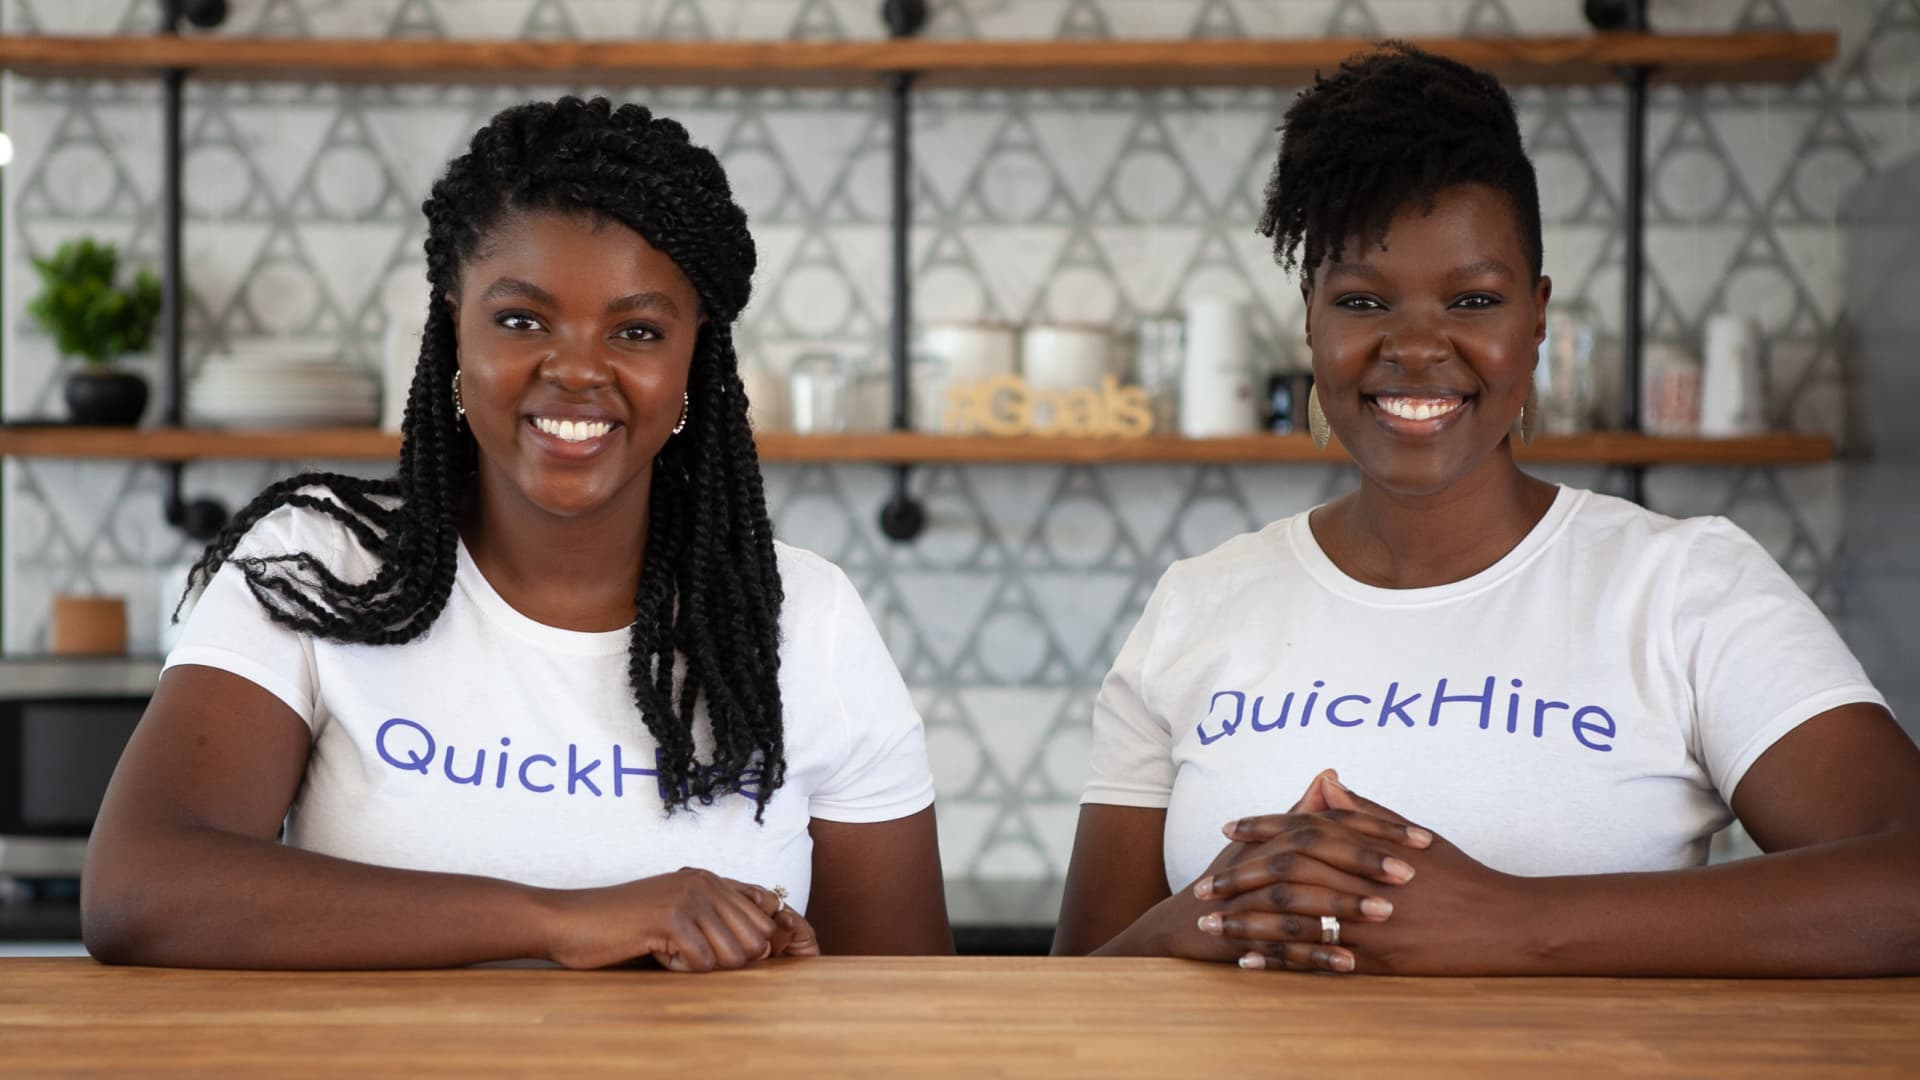 Angela Muhwezi-Hall and Deborah Gladney started QuickHire, a hiring platform, during the pandemic.